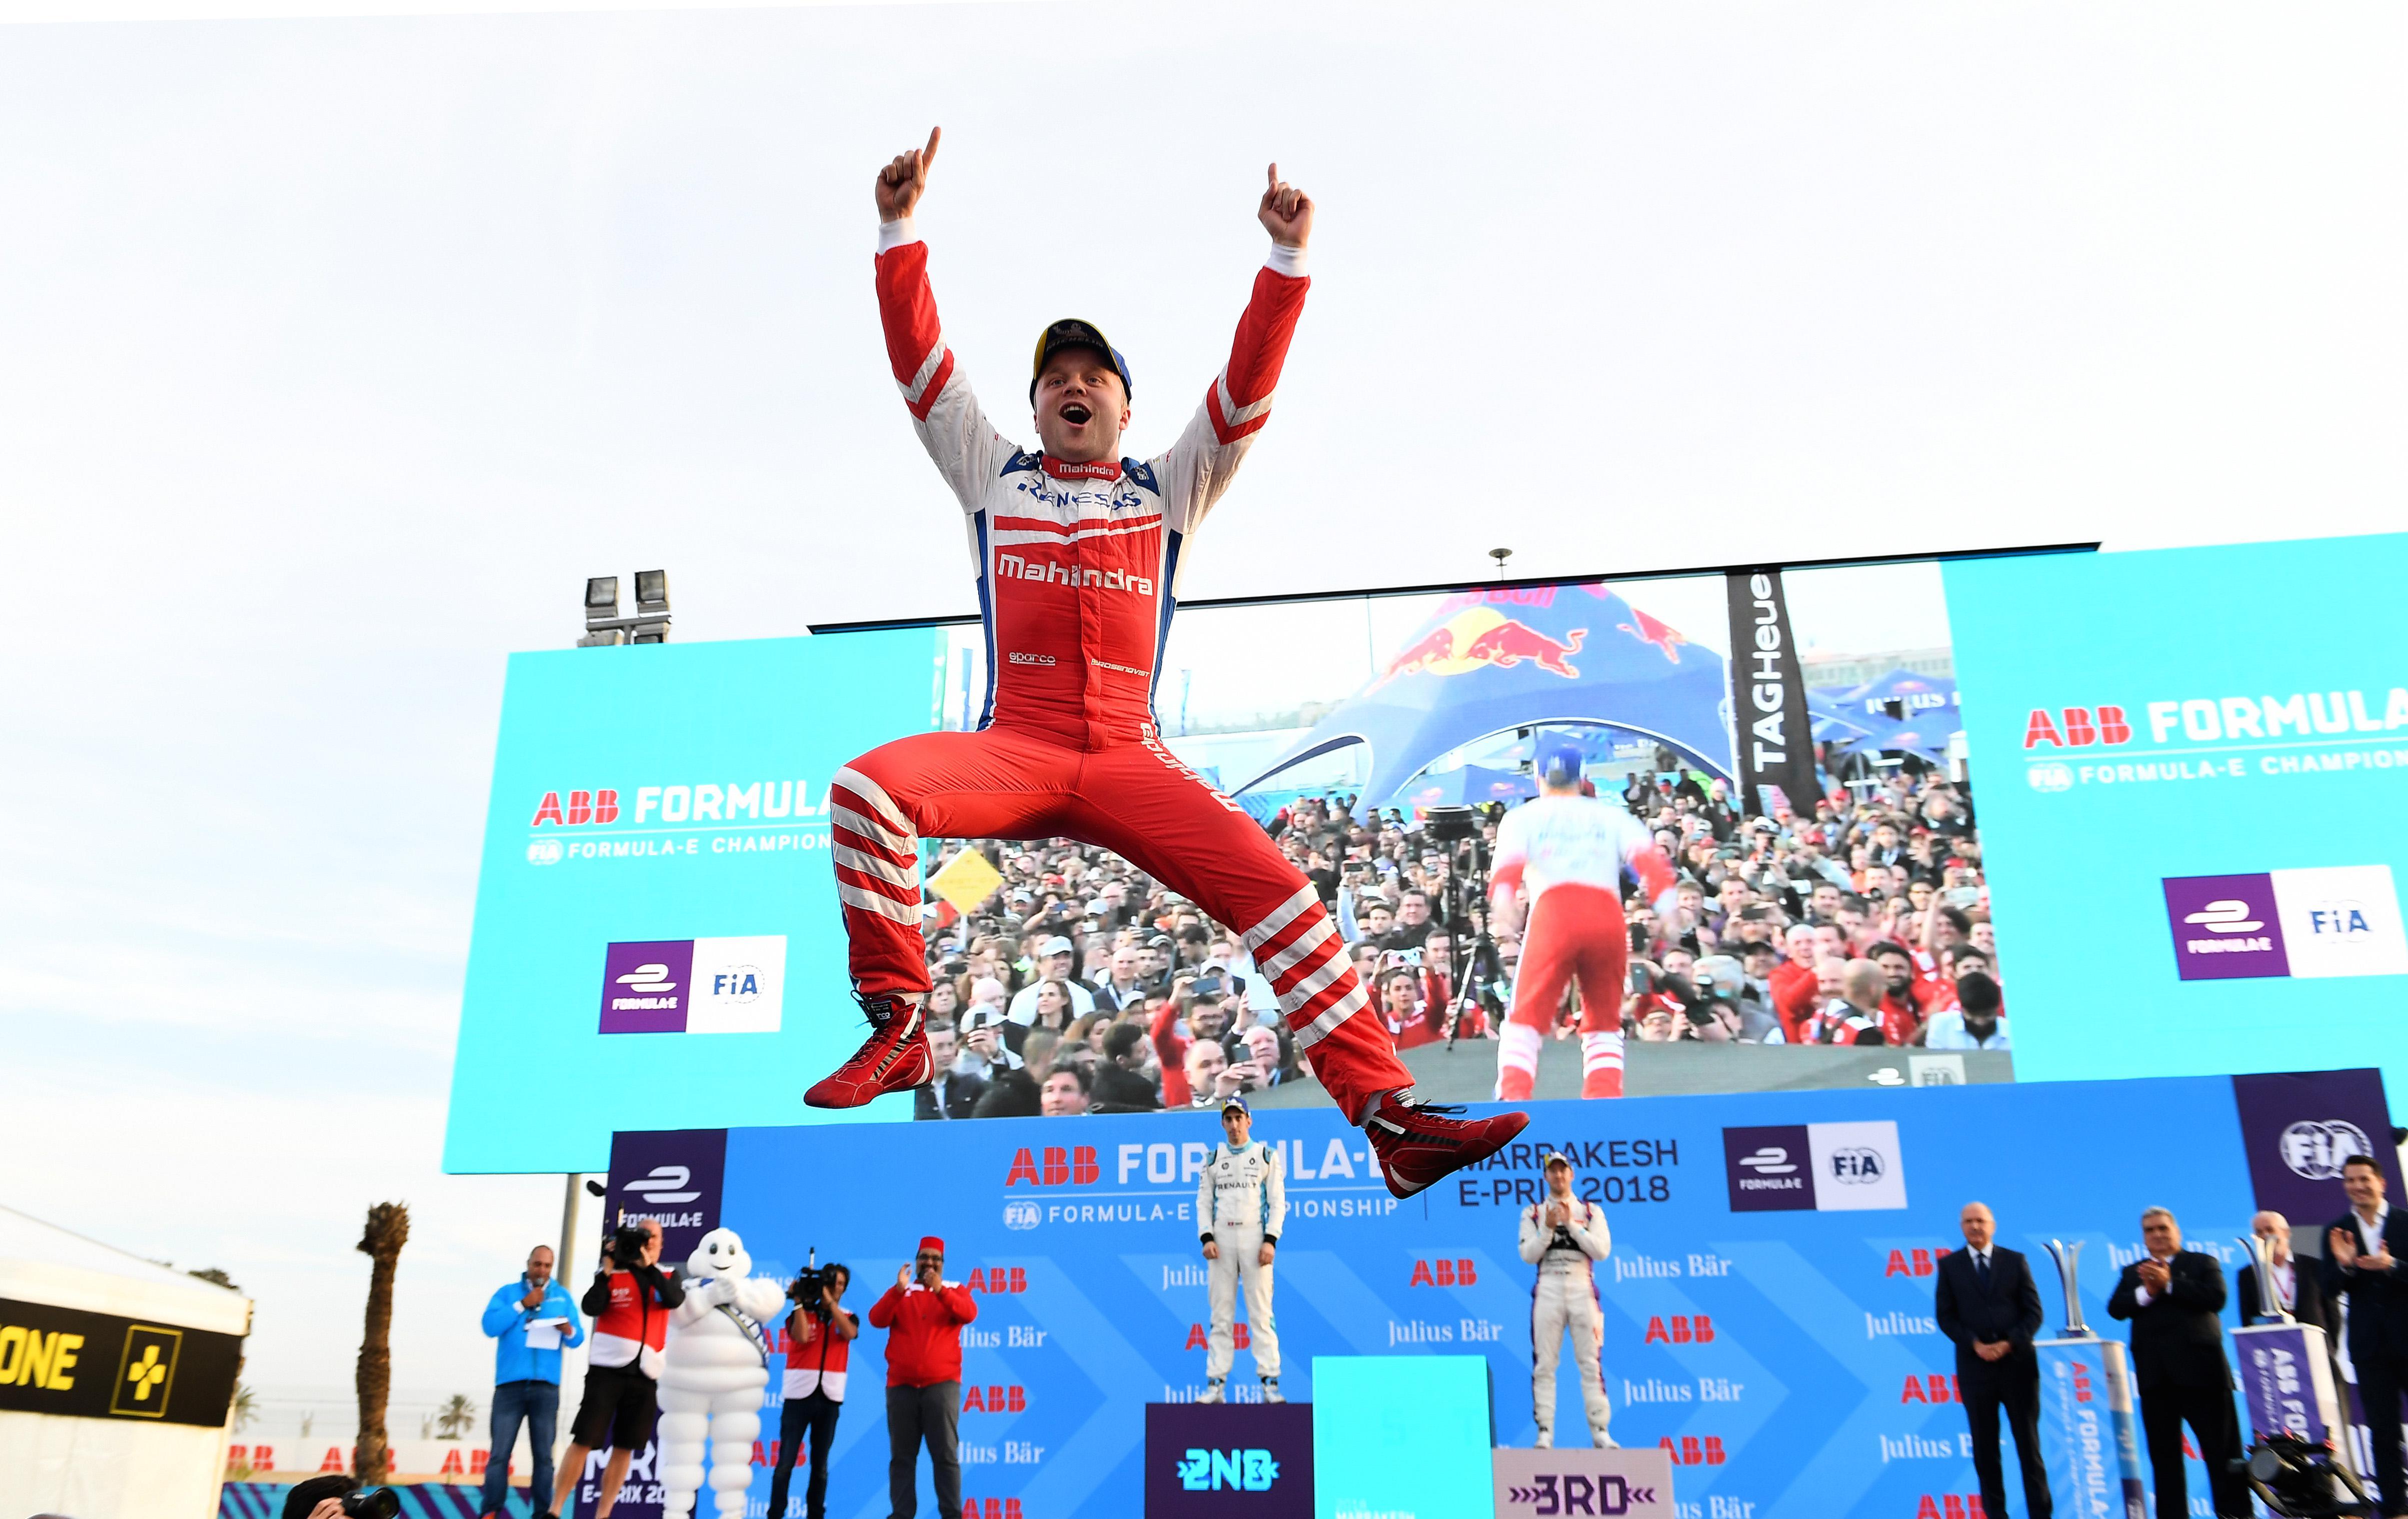 Forumula E driver Felix Rosenqvist celebrating on the podium in Marrakesh